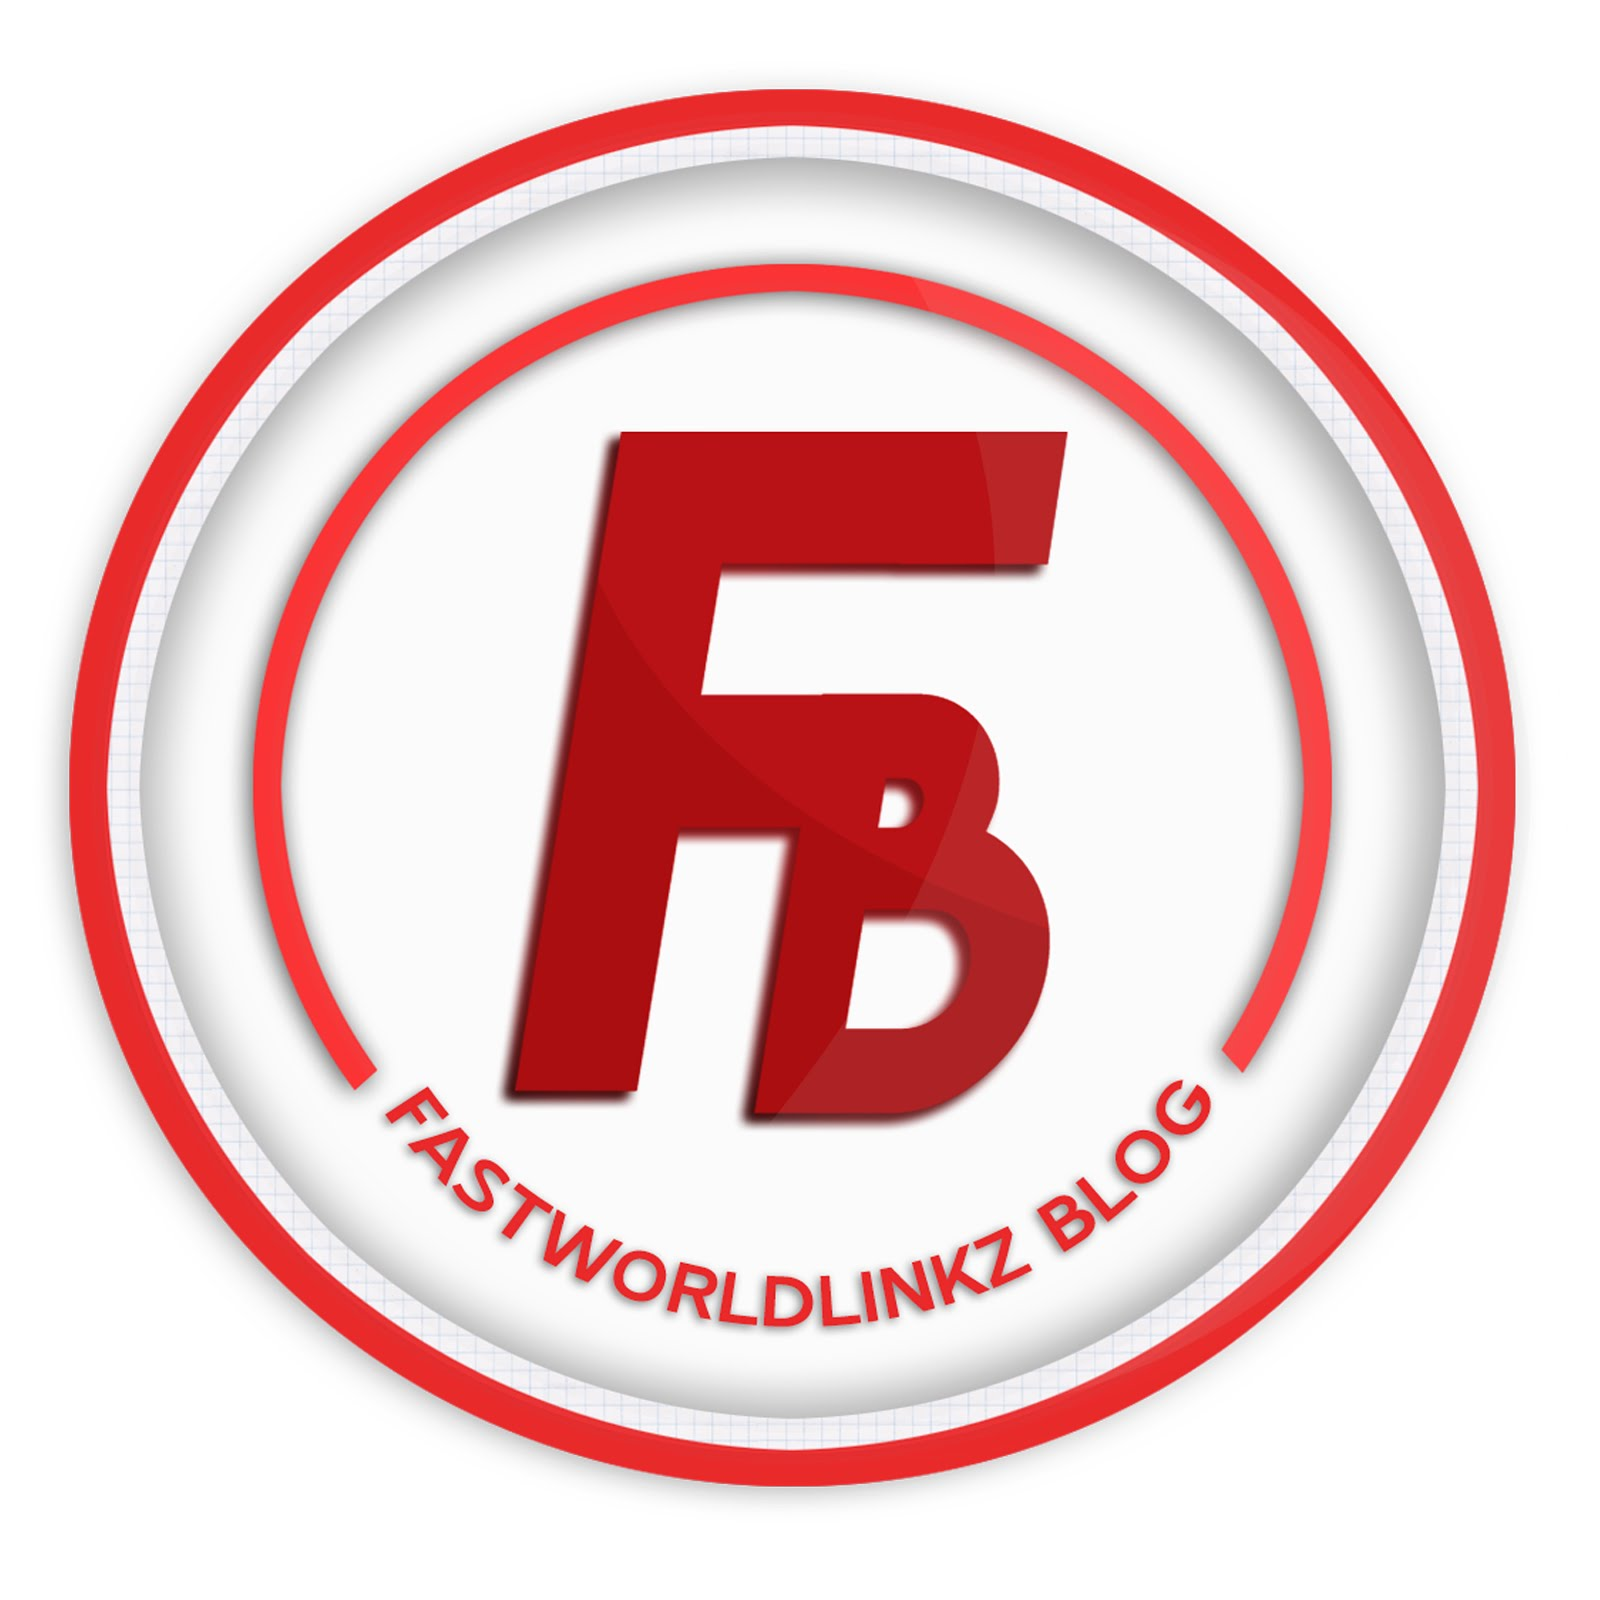 Fastworldlink.com | World Gist Villa